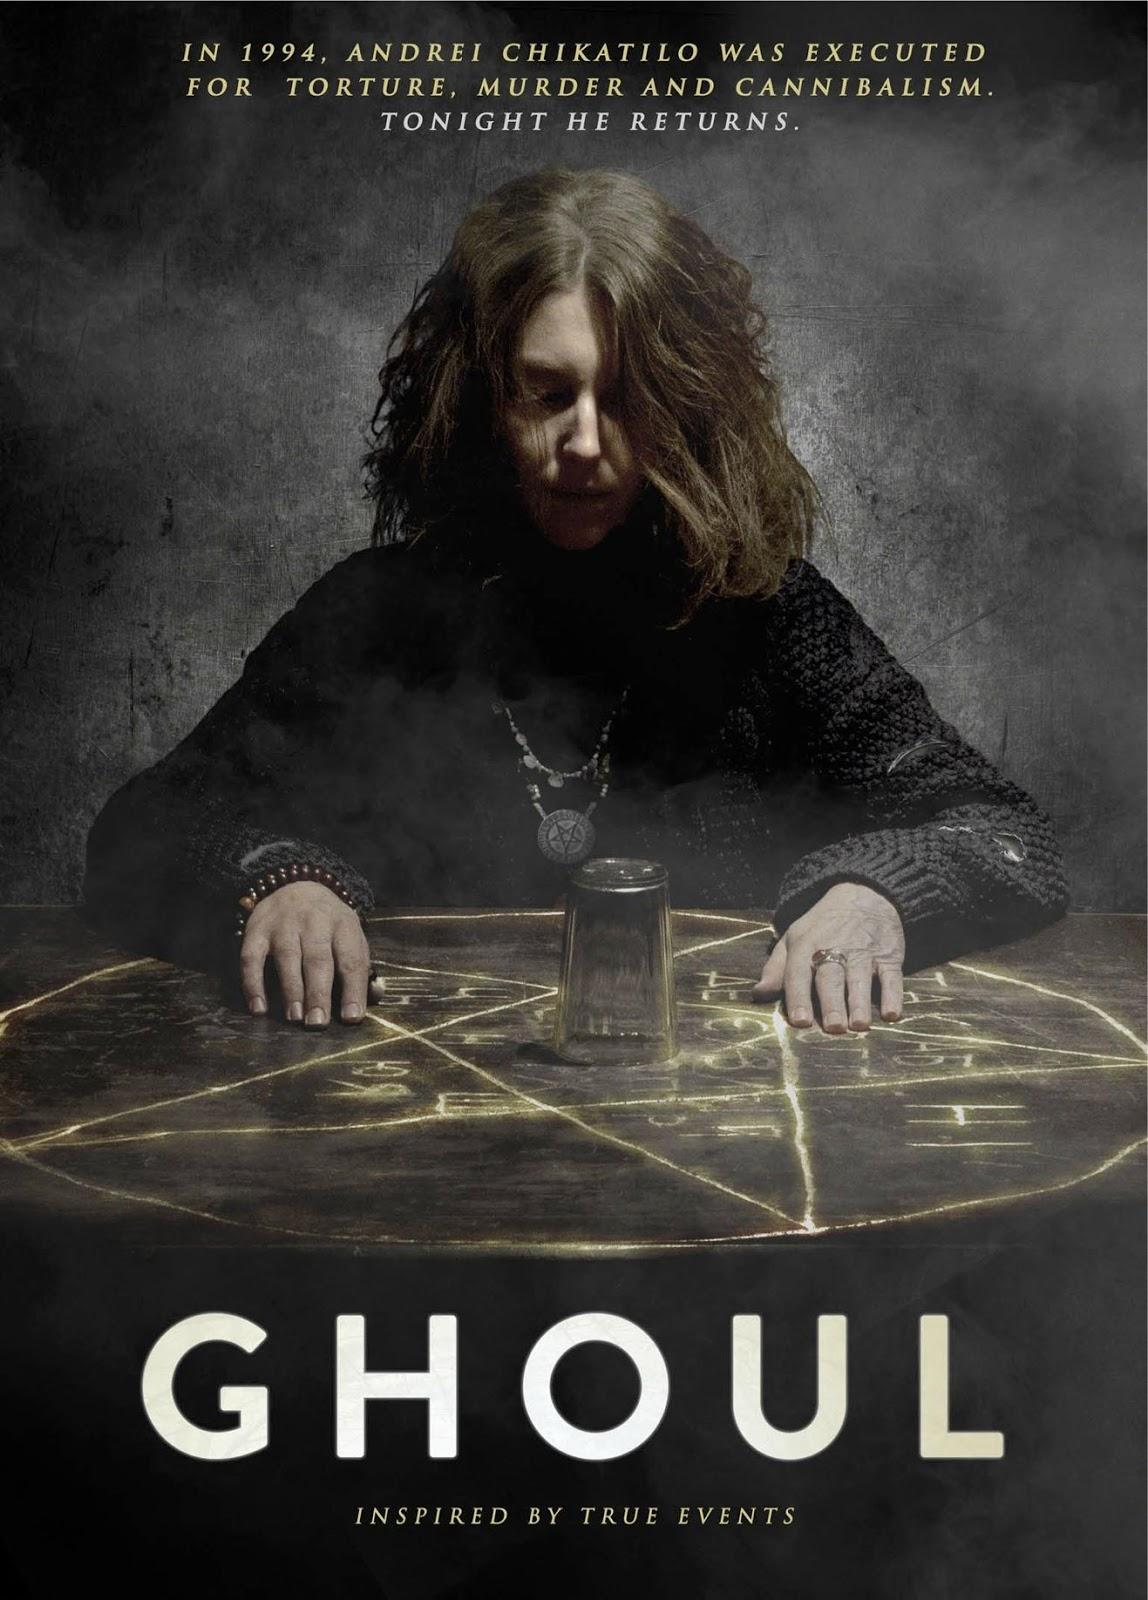 Ghoul 2015